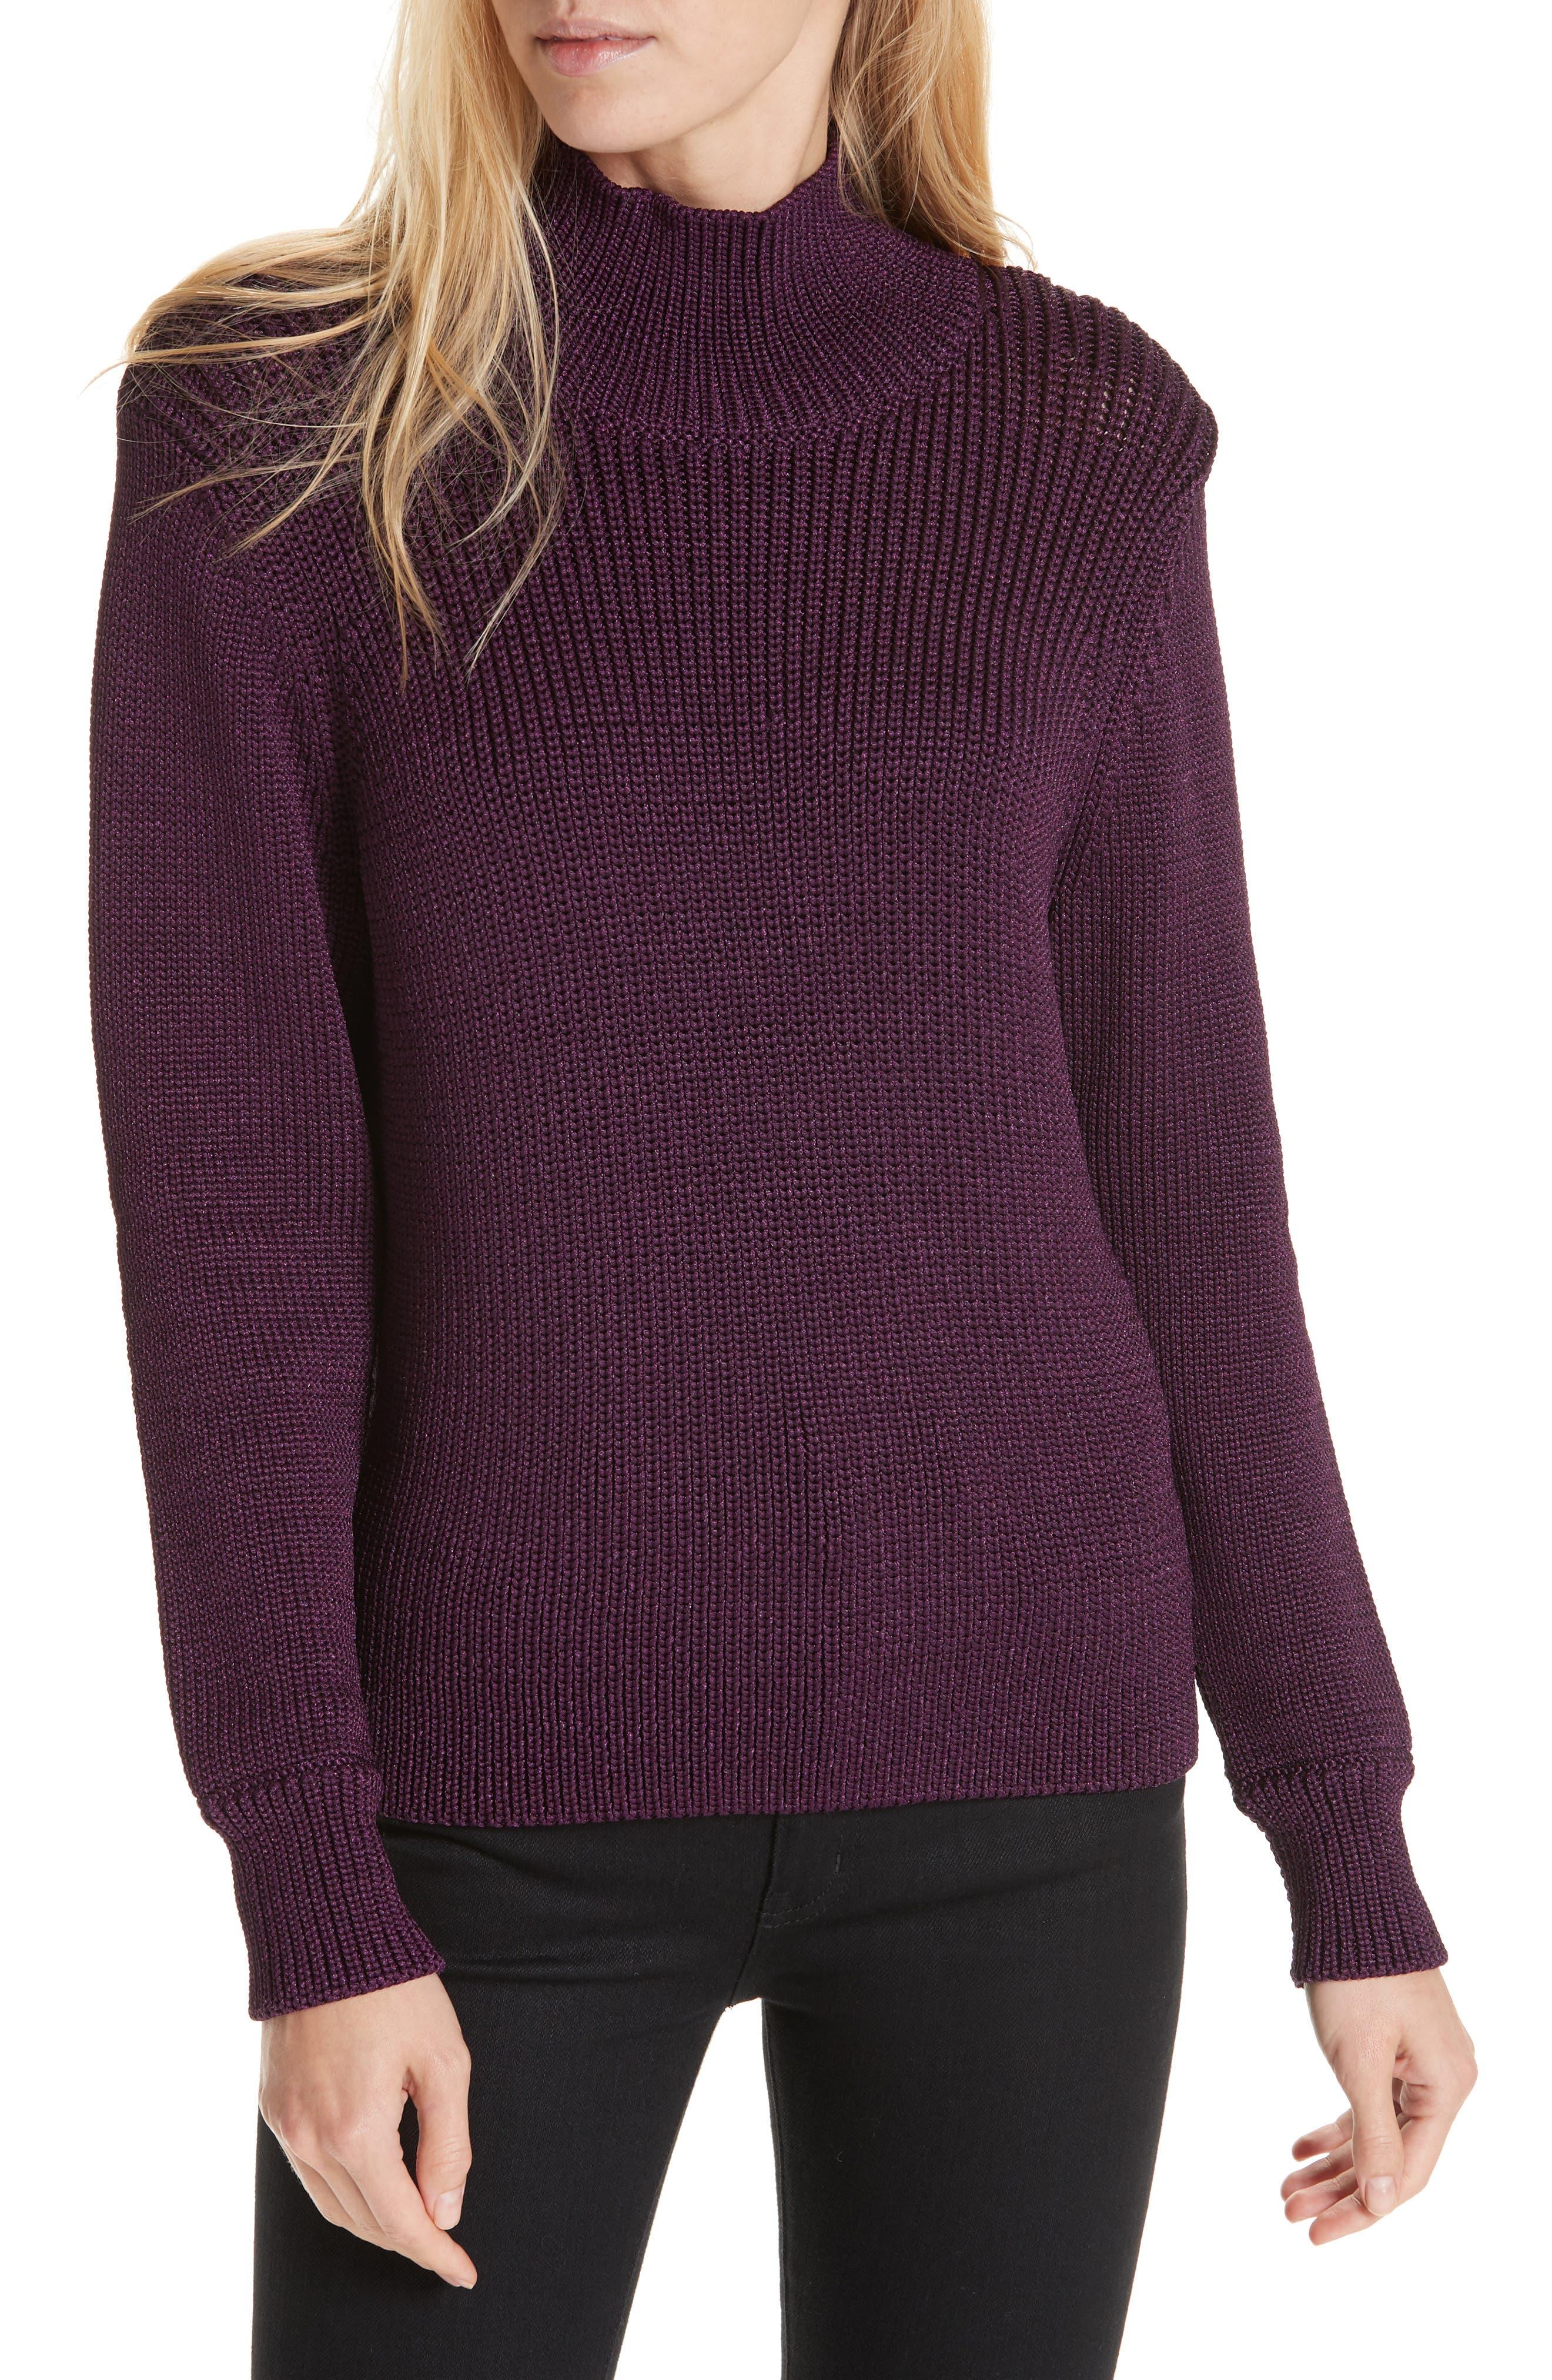 Image of Lewit Funnel Neck Metallic Sweater